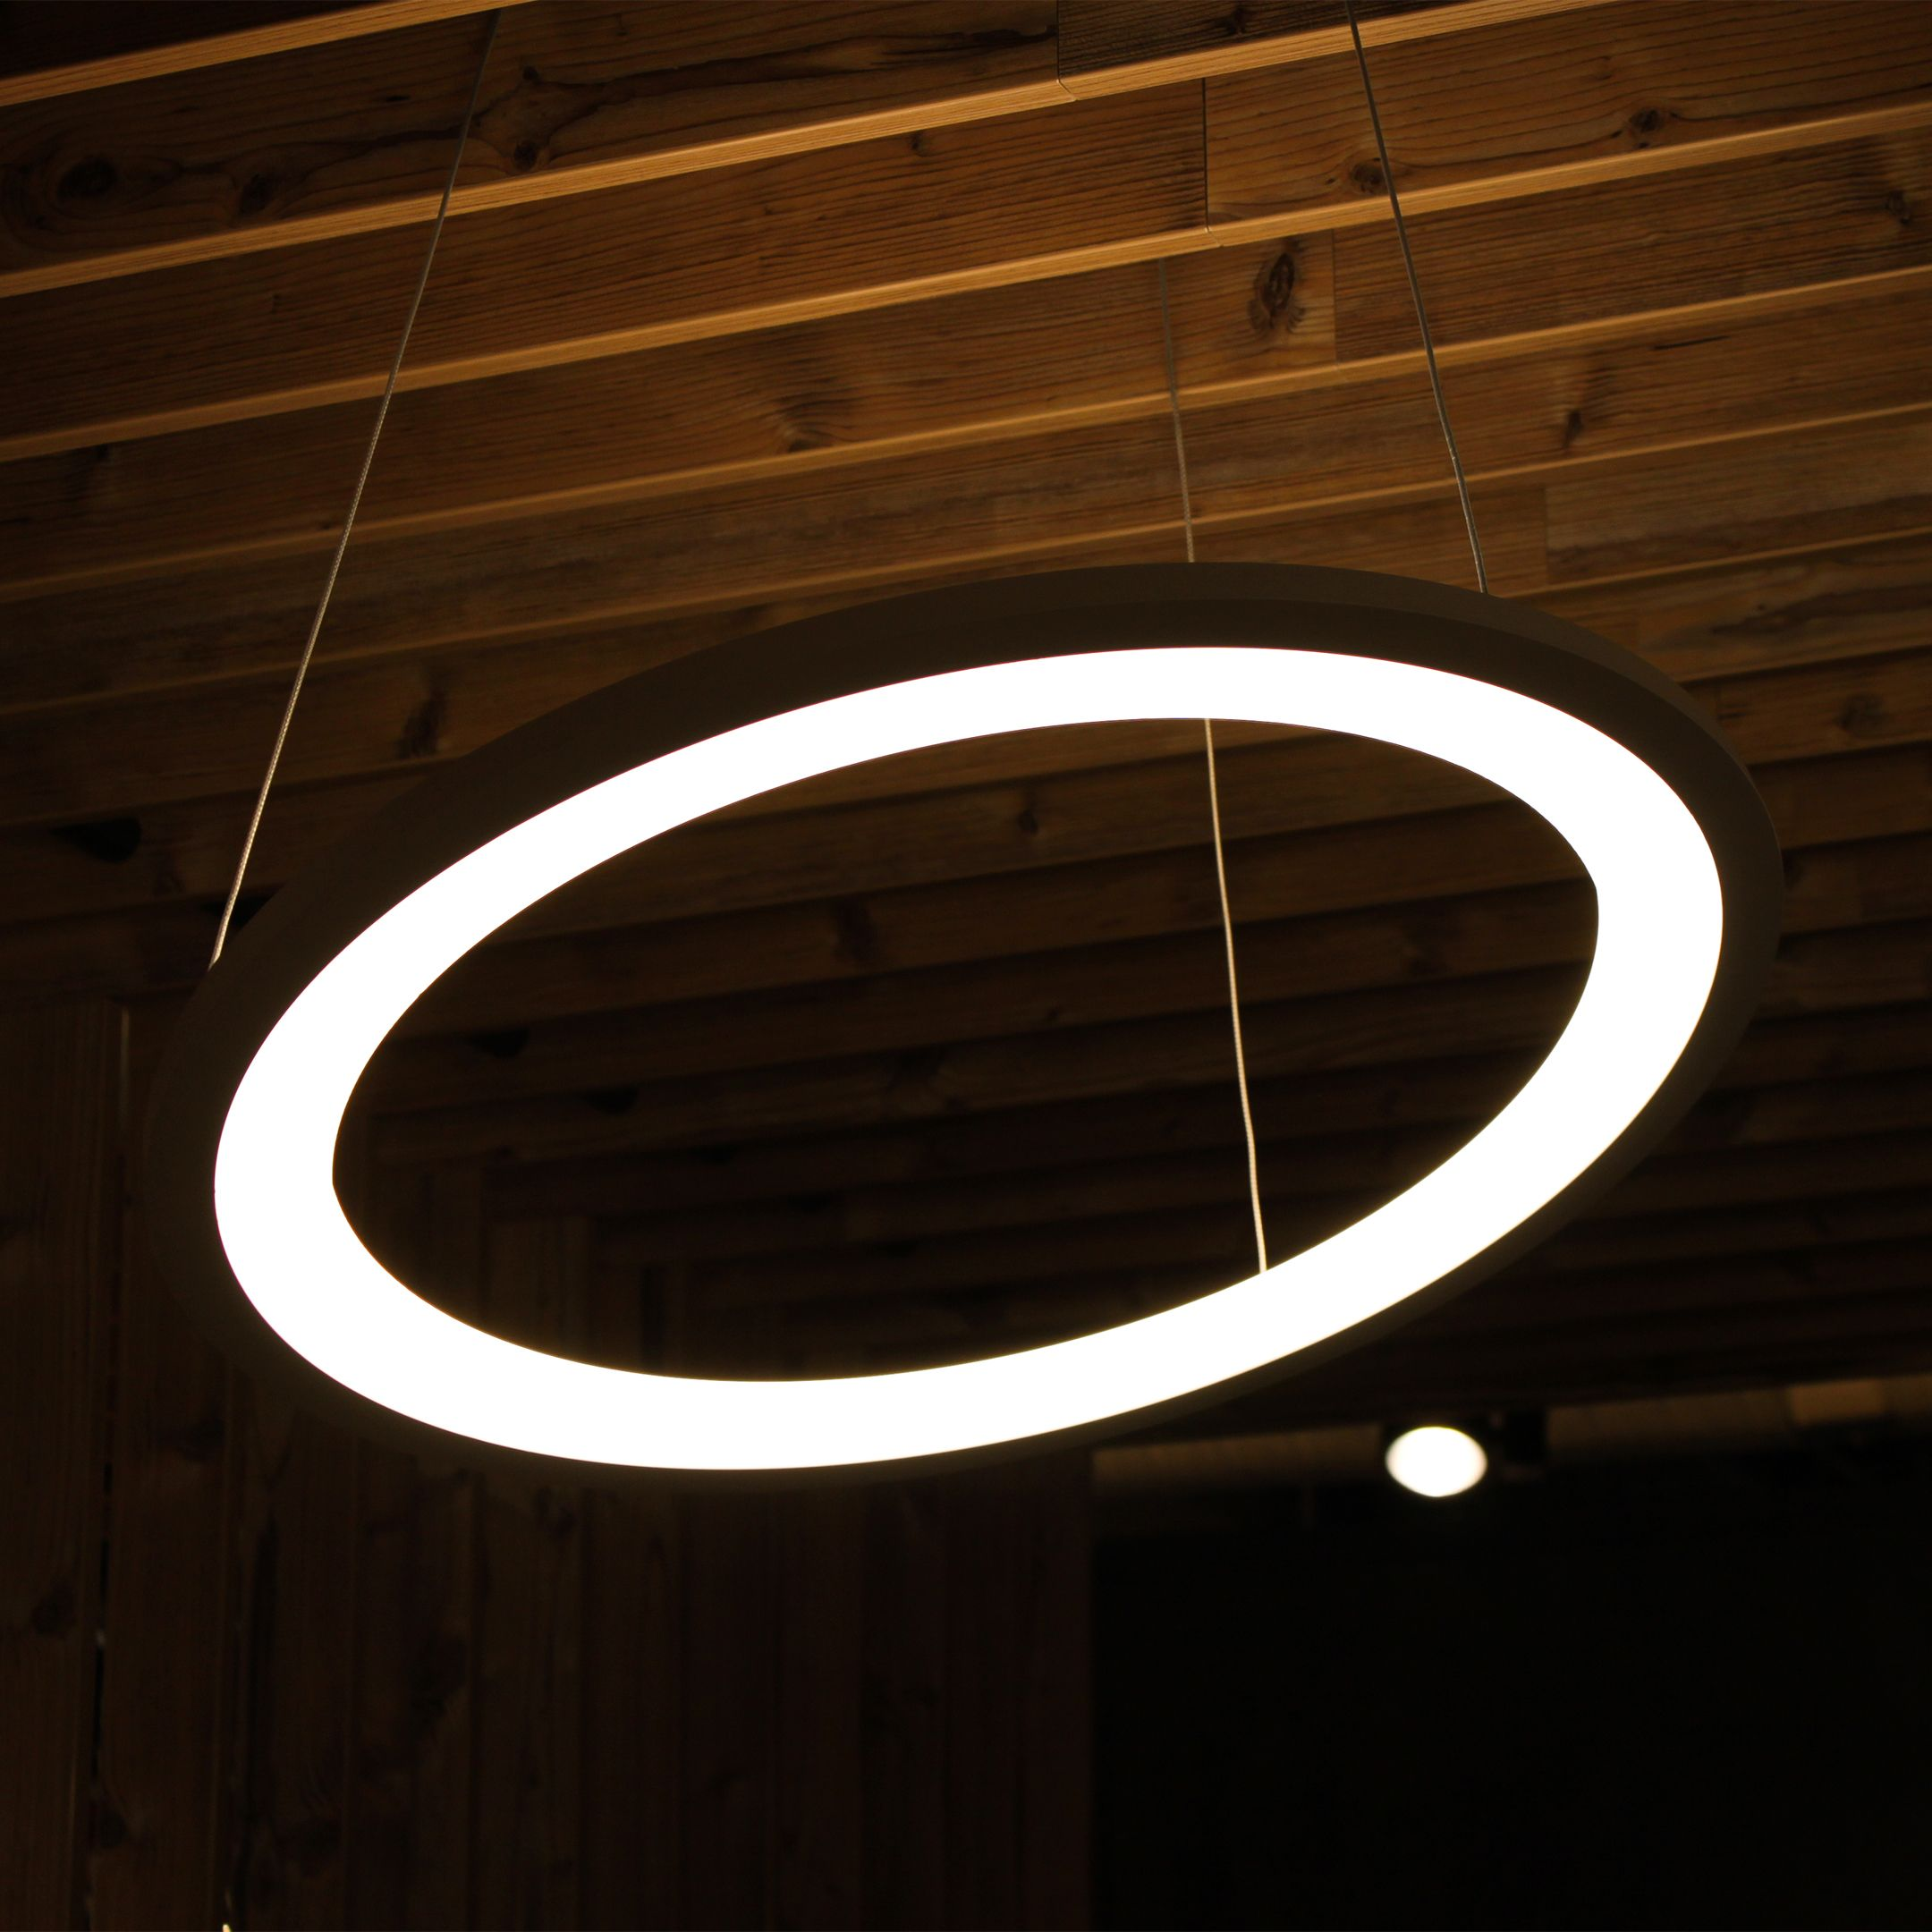 Stylish Led Ring For Shop Lighting Ladenbeleuchtung Ladeneinrichtung Licht